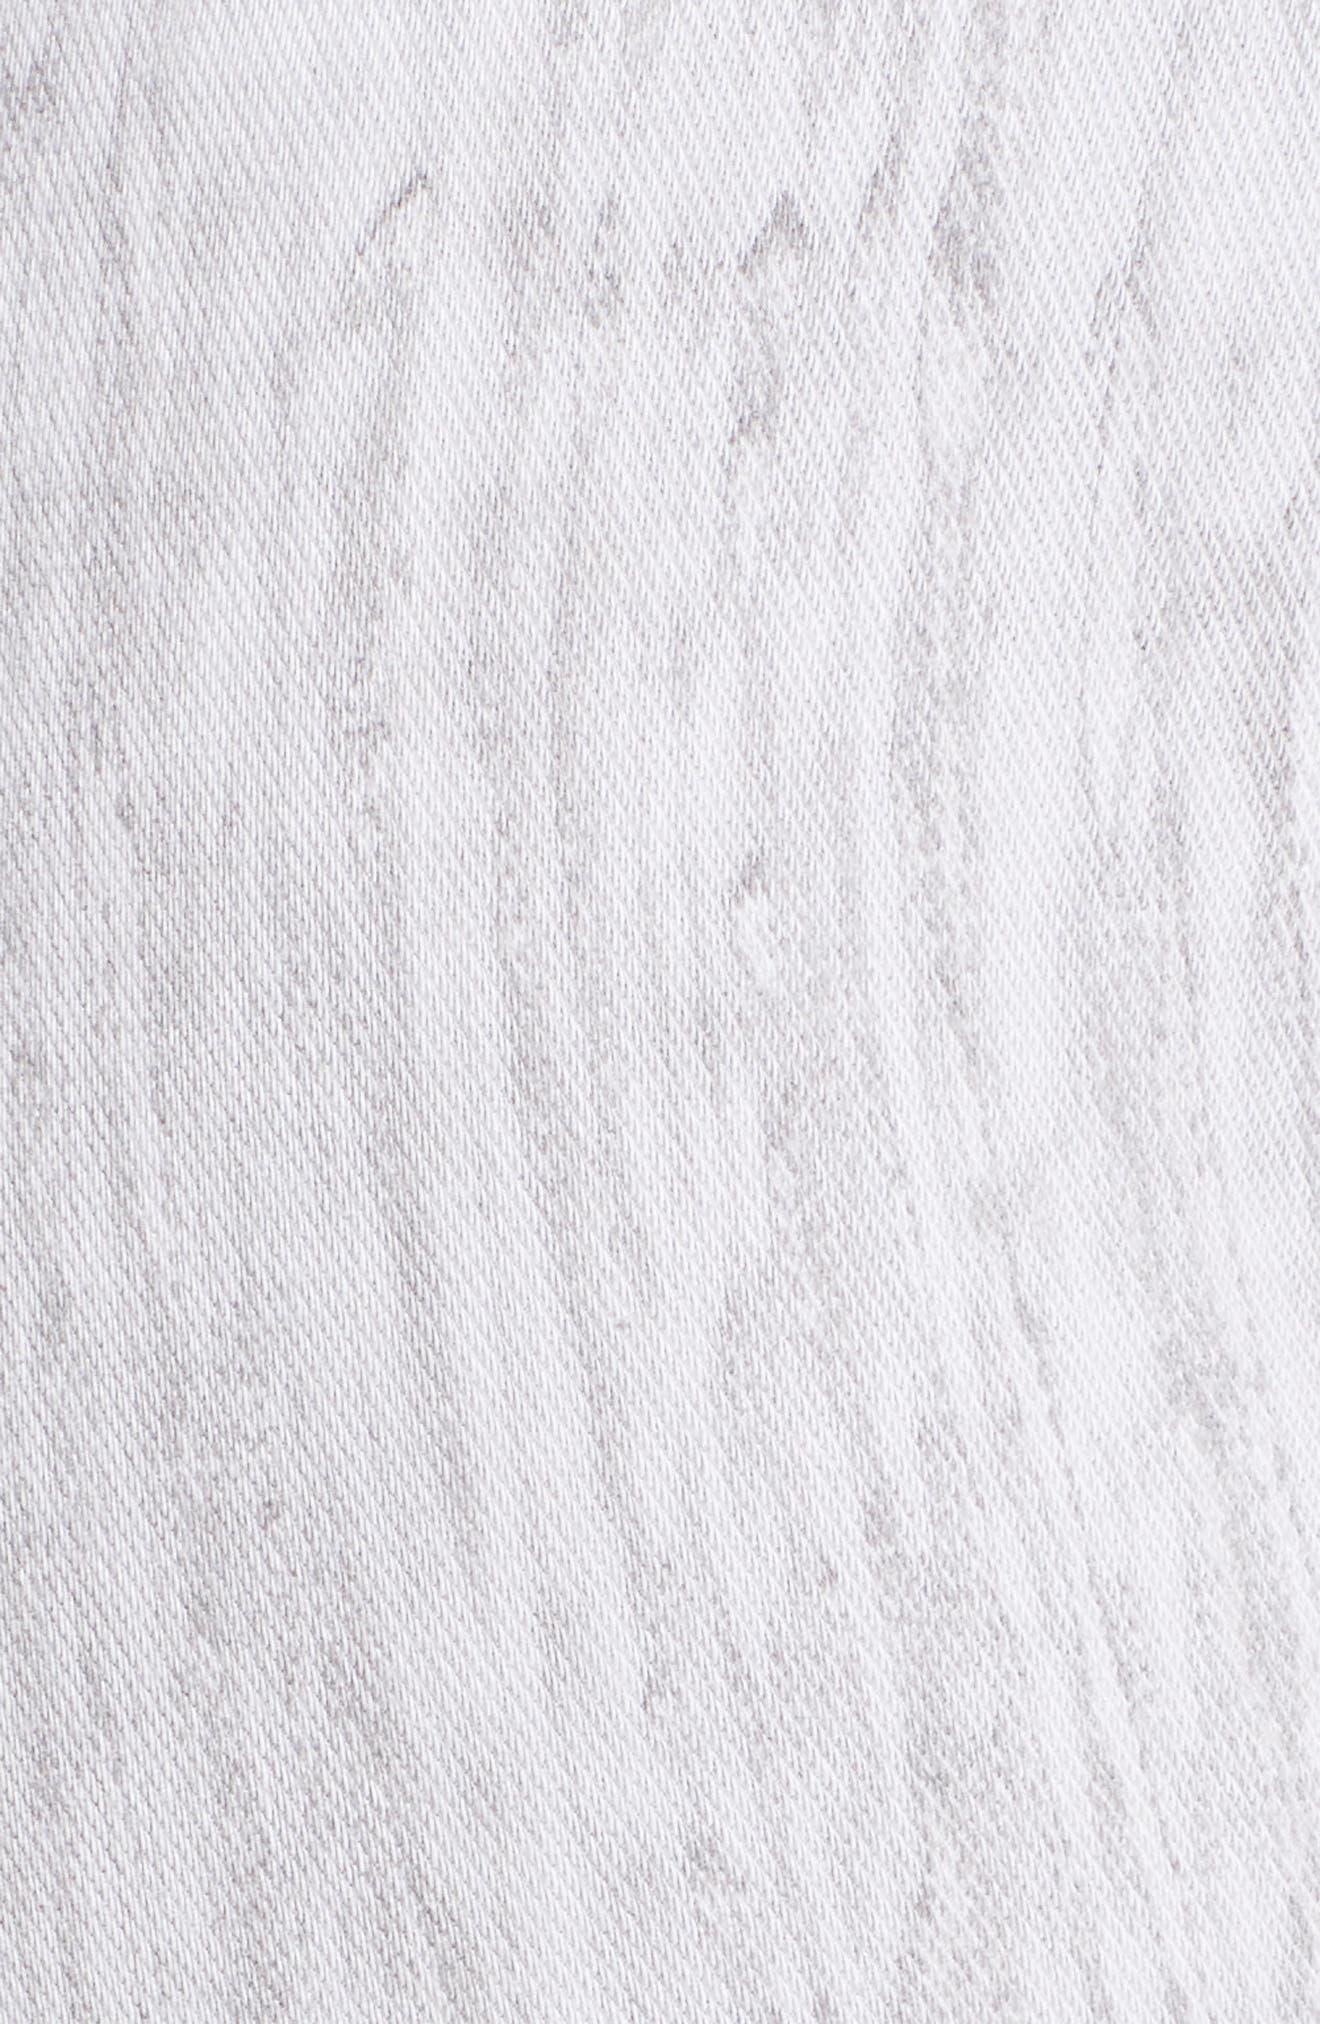 Lyssè Toothpick Denim Leggings,                             Alternate thumbnail 5, color,                             GREY TIE DYE